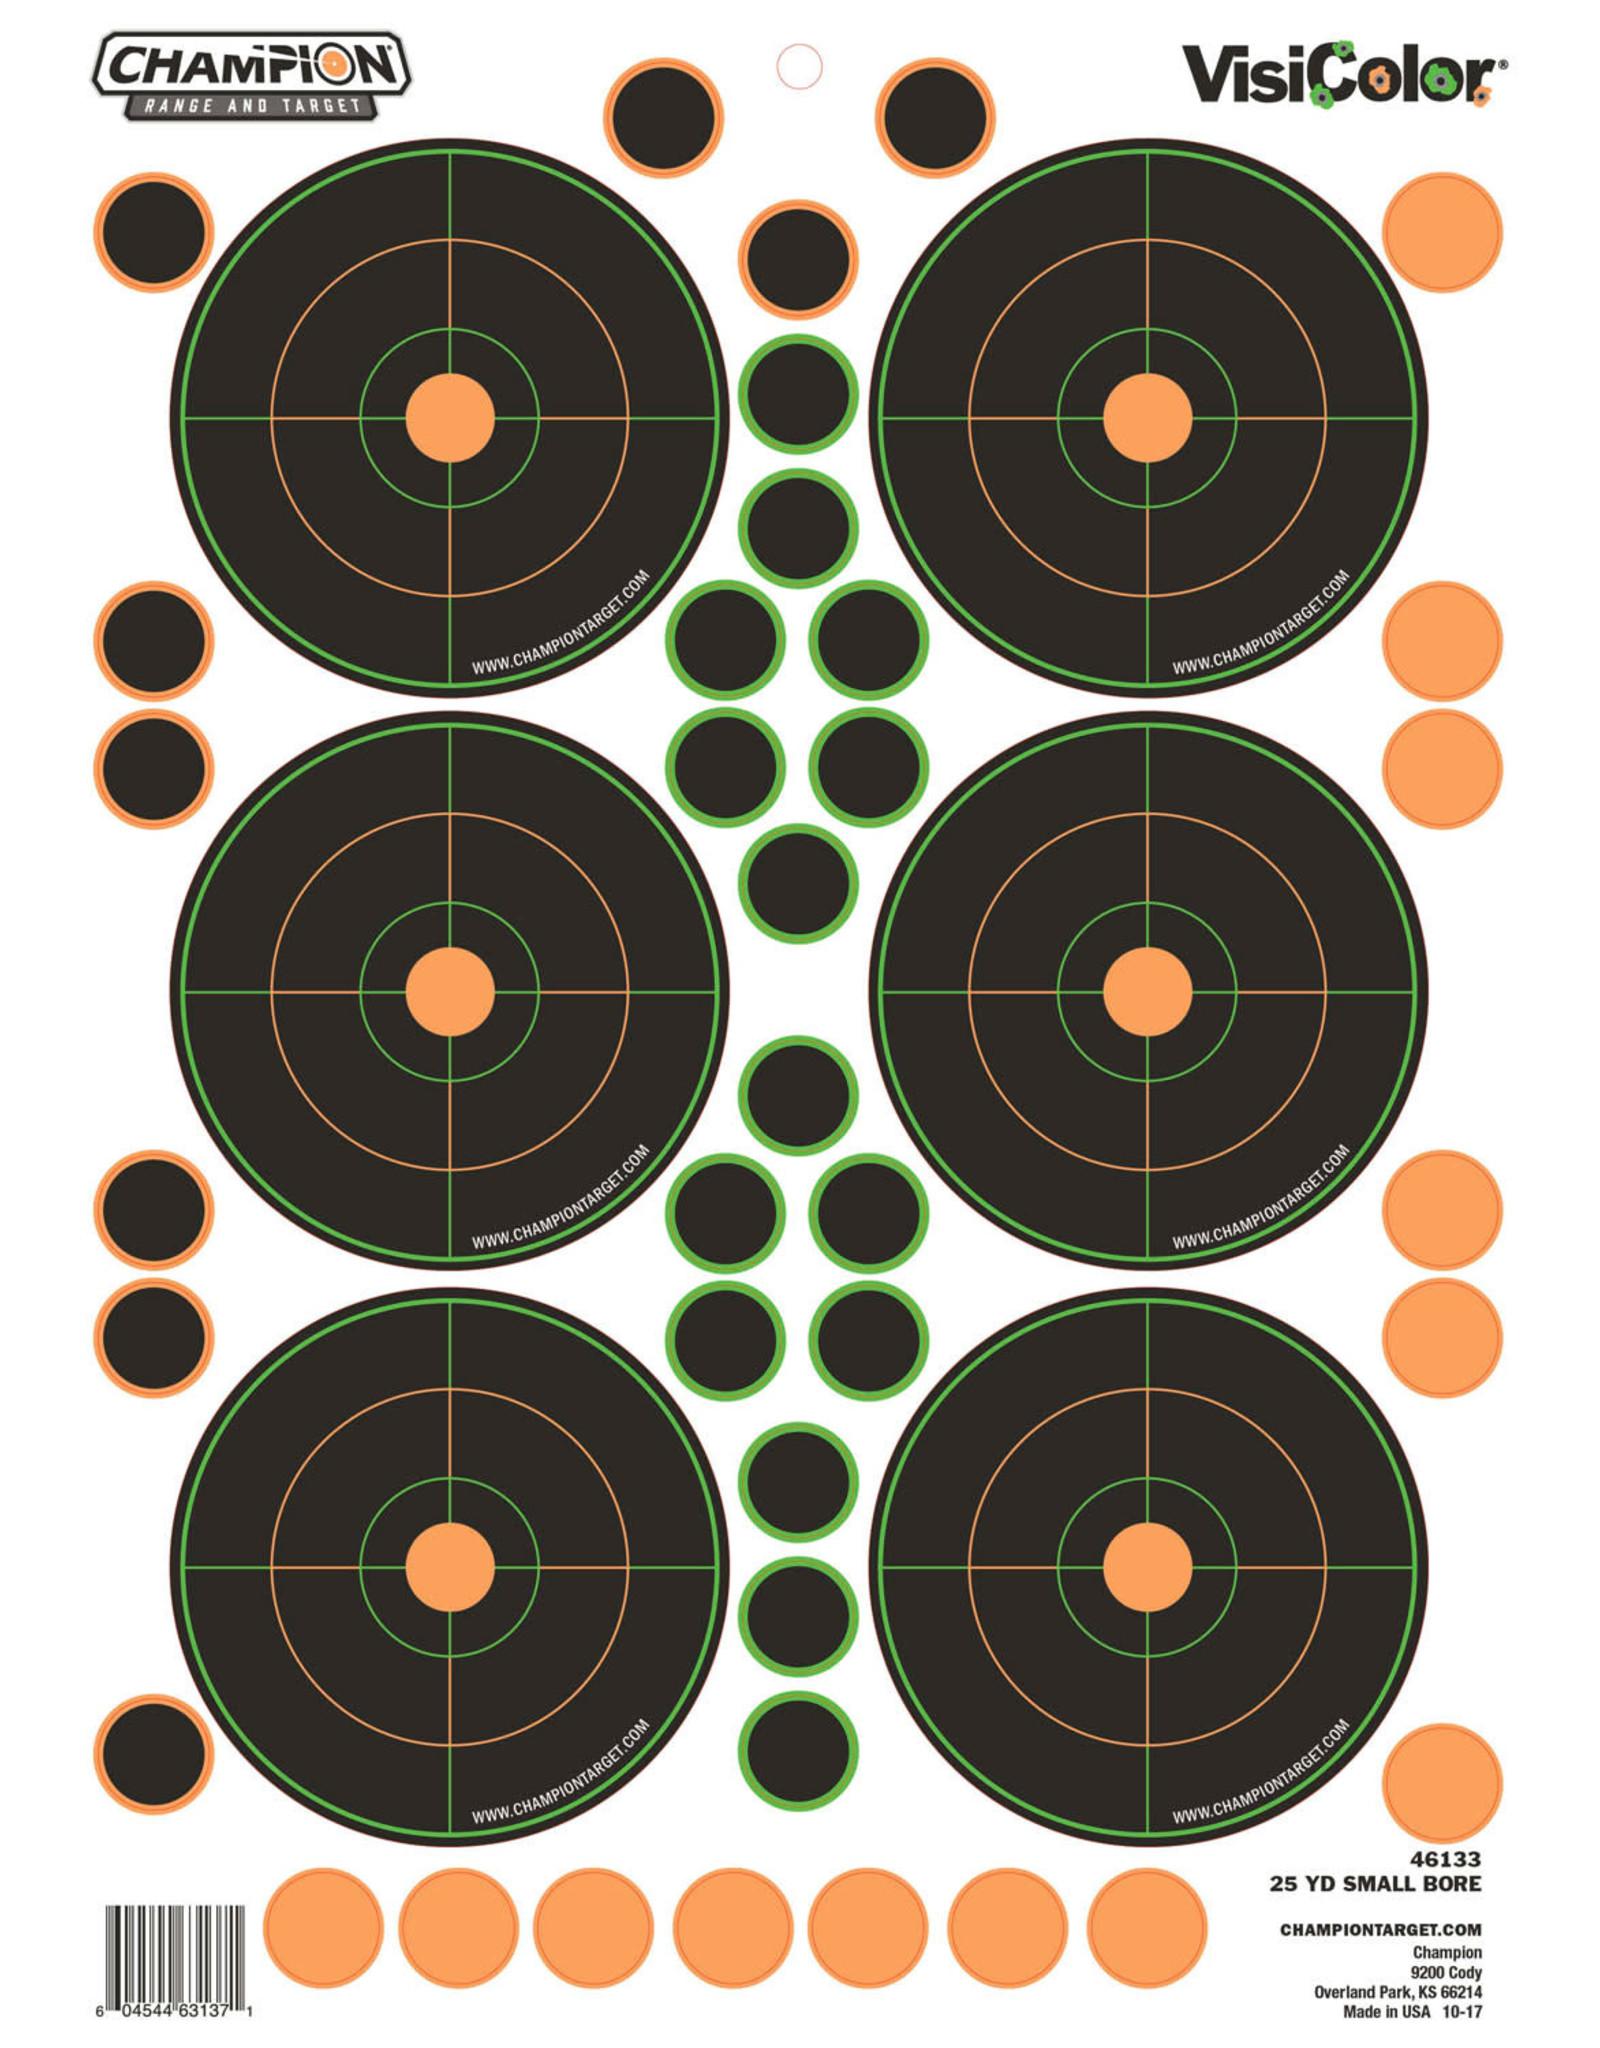 "CHAMPION TARGETS Champion VisiColor Self-Adhesive Paper 8.5"" x 11.5"" Circle Orange/Black 5 Pack"